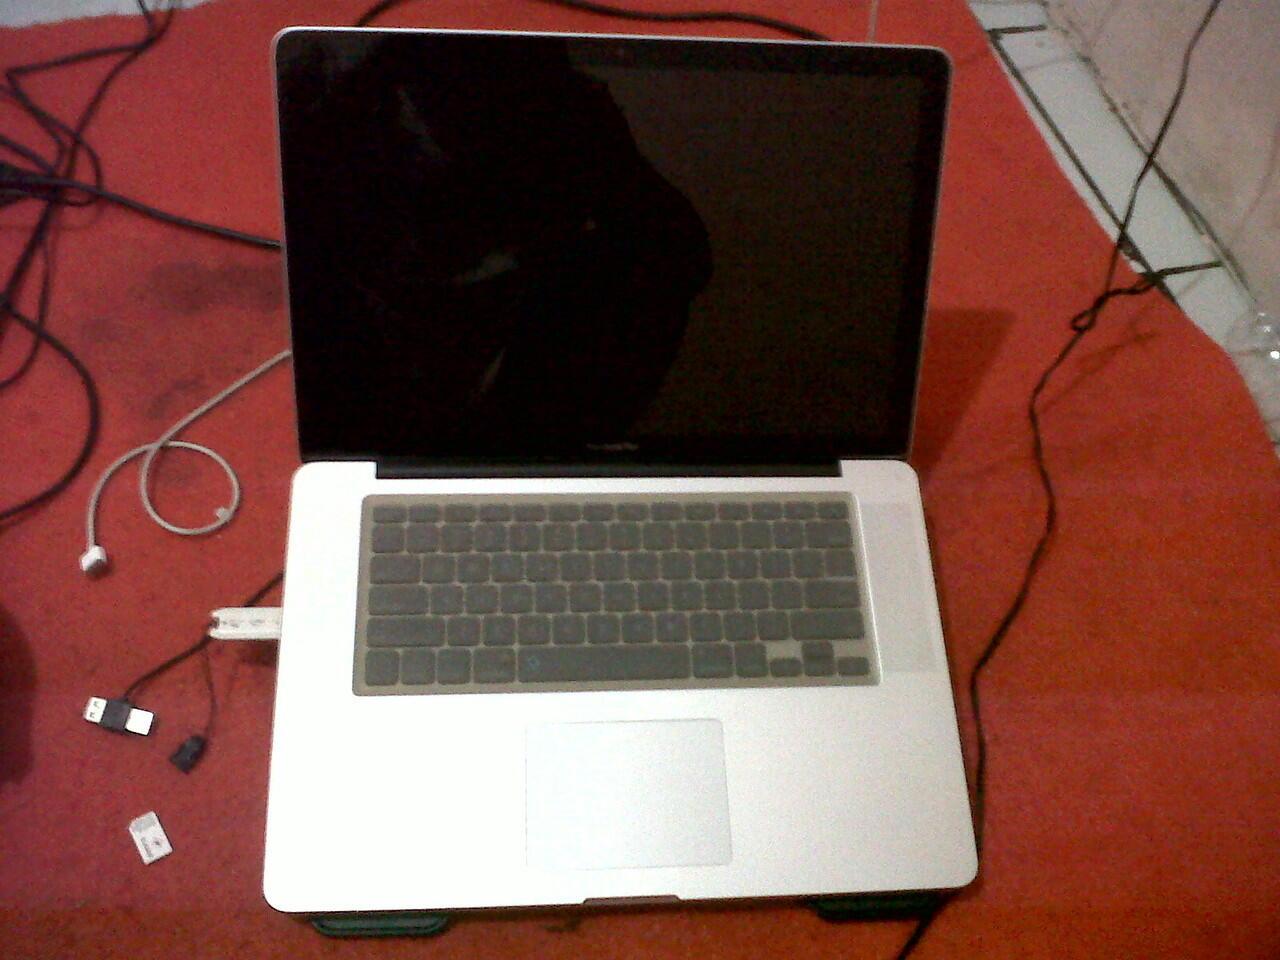 Macbok Pro 15 inch | Hd 1 TB | RAM 8 GB | Spek sadis ! Harga Murah !